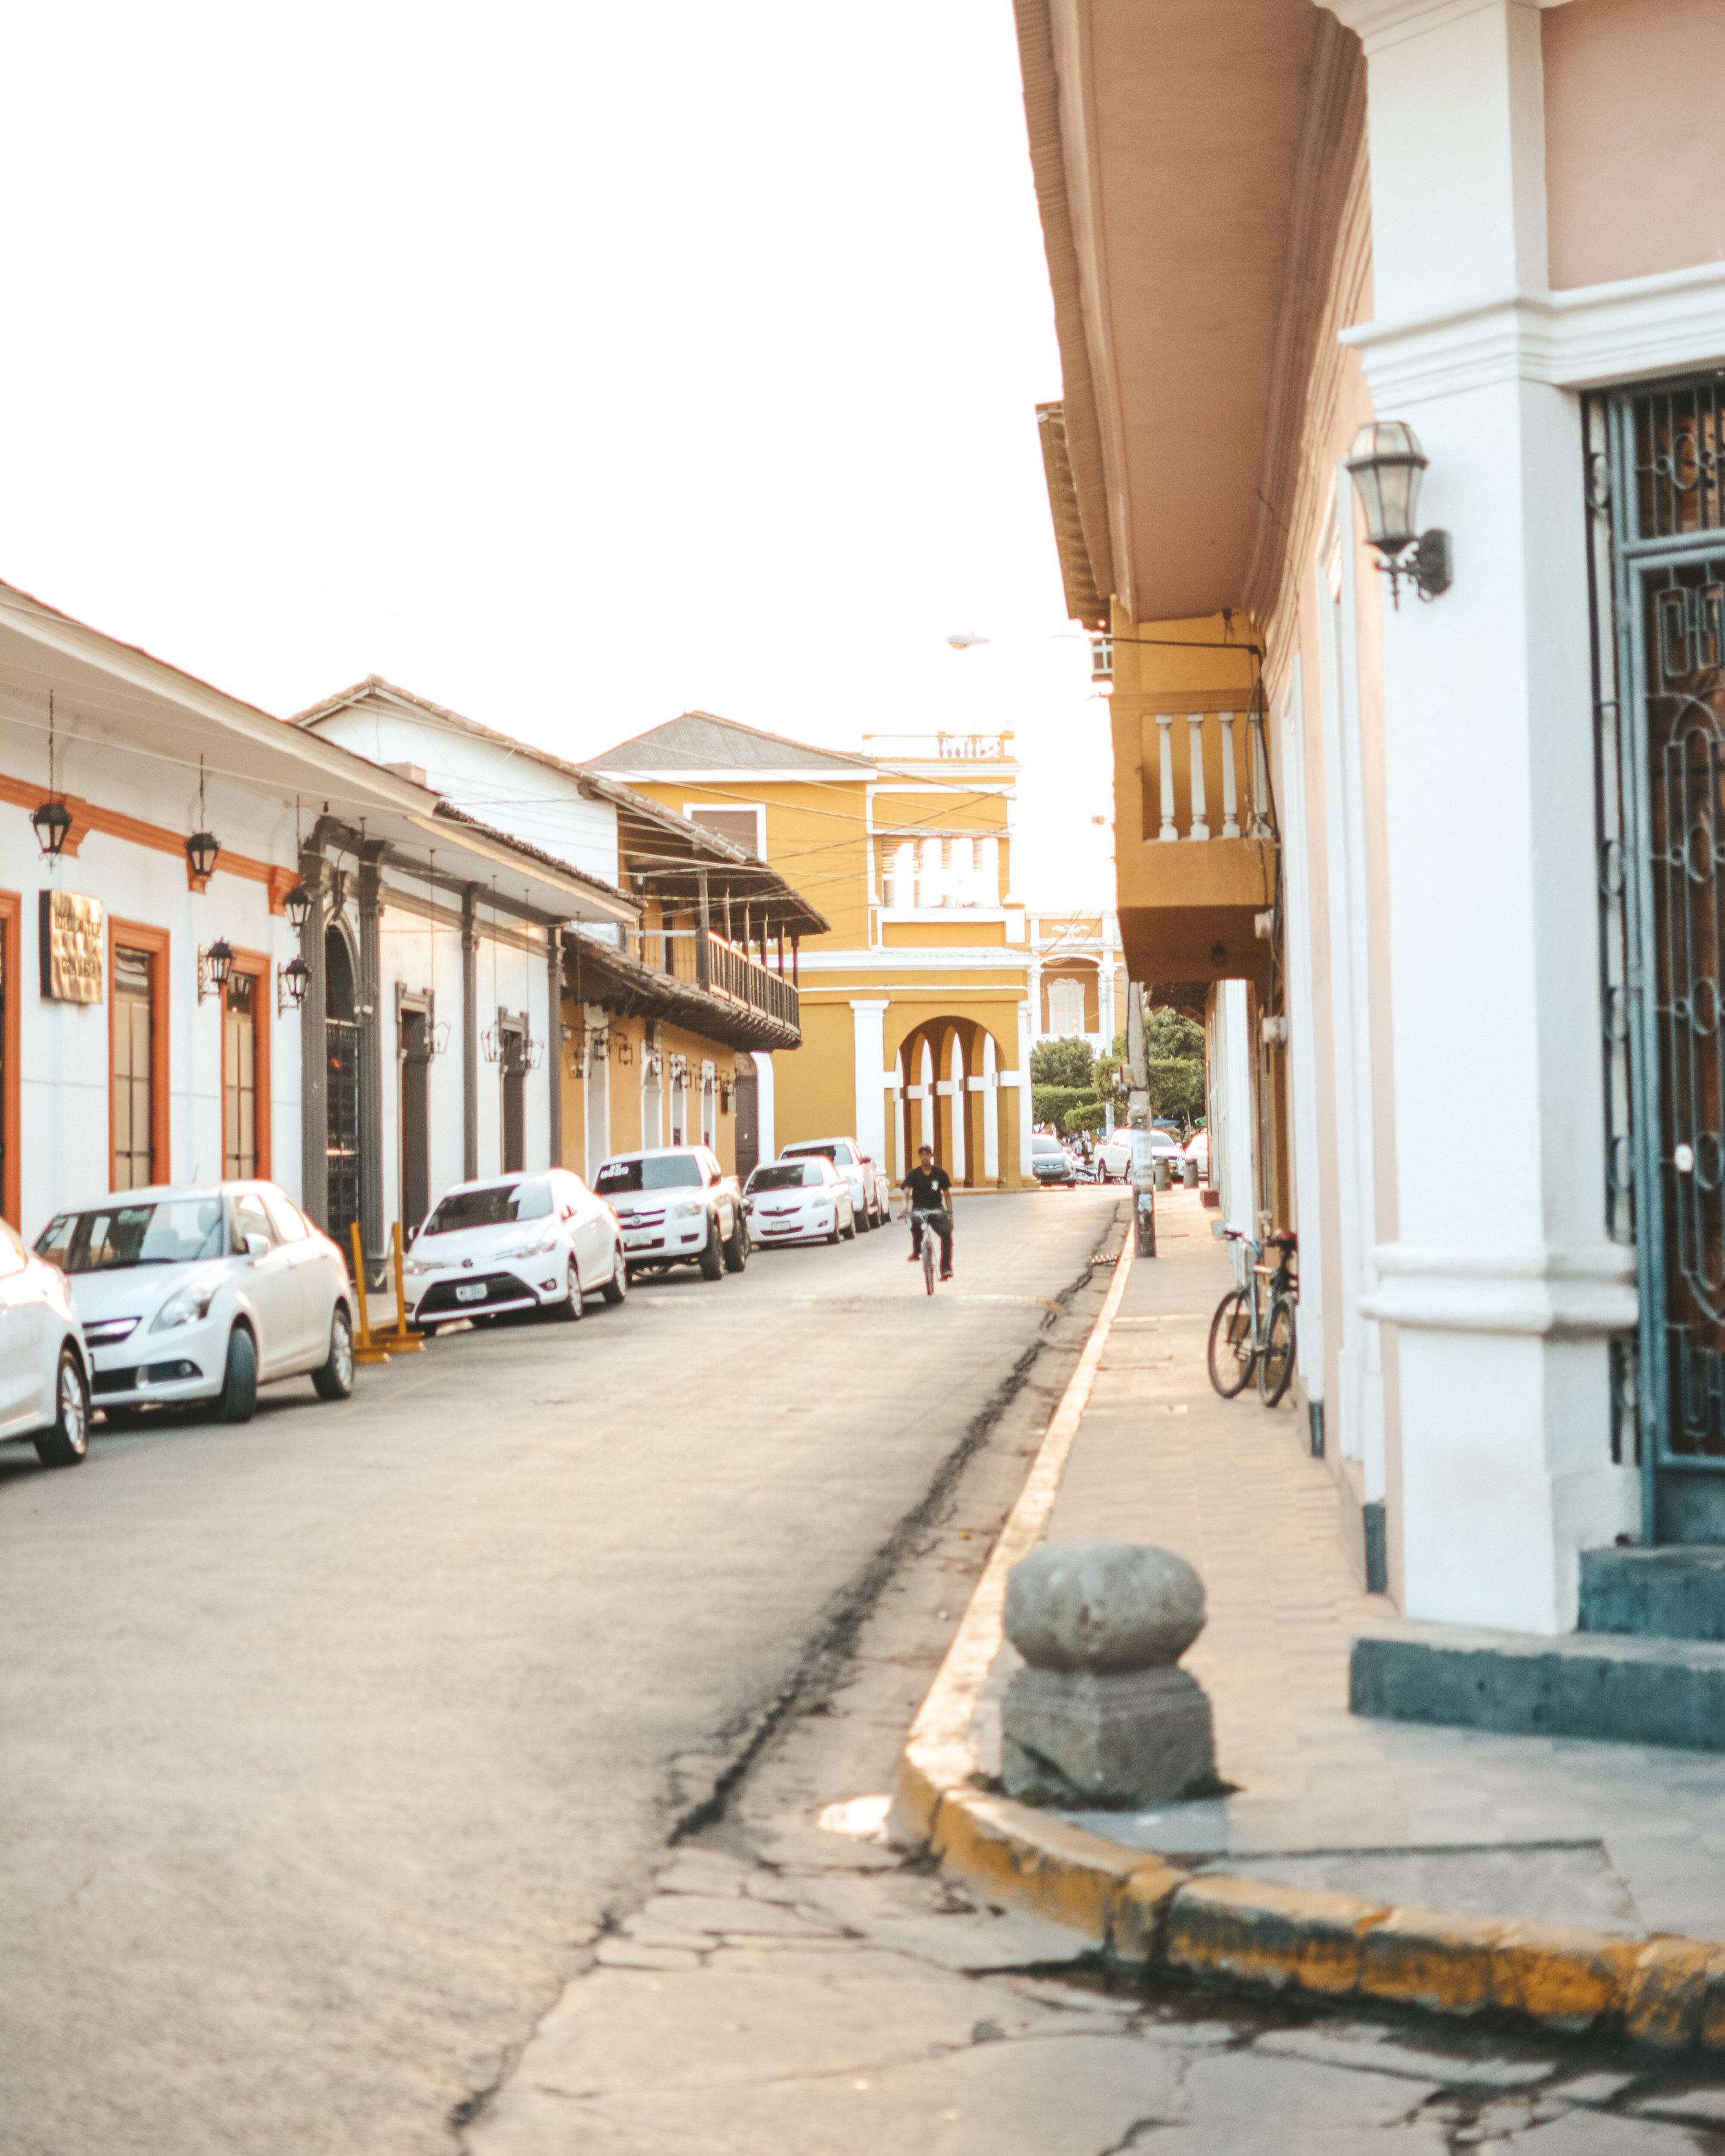 The streets of Granada, Nicaragua